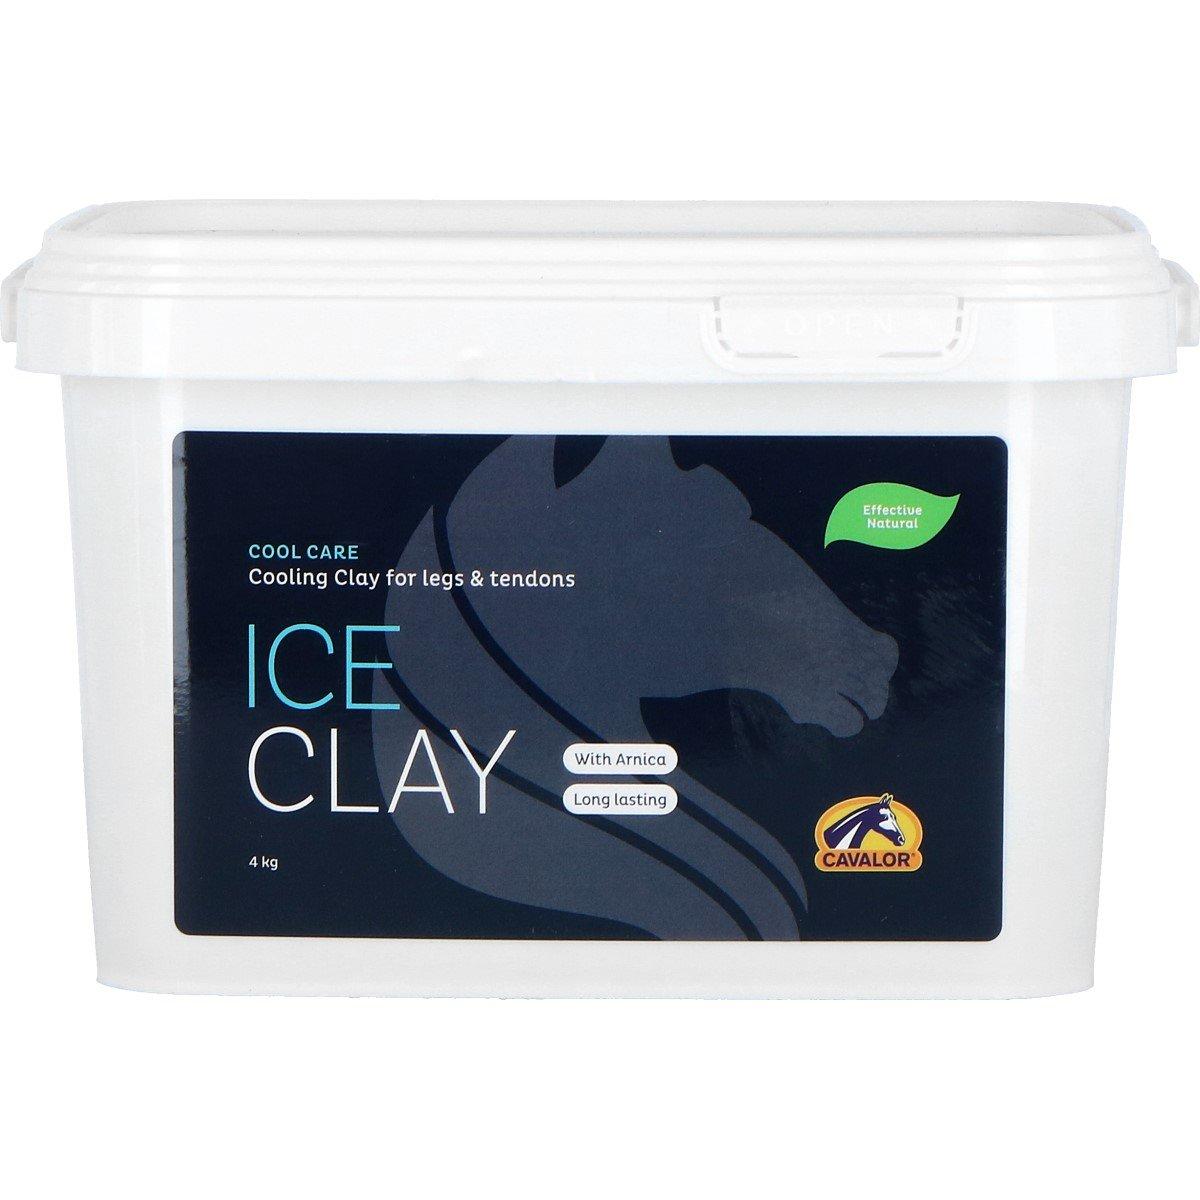 Afbeelding van Cavalor Ice Clay 4 kg